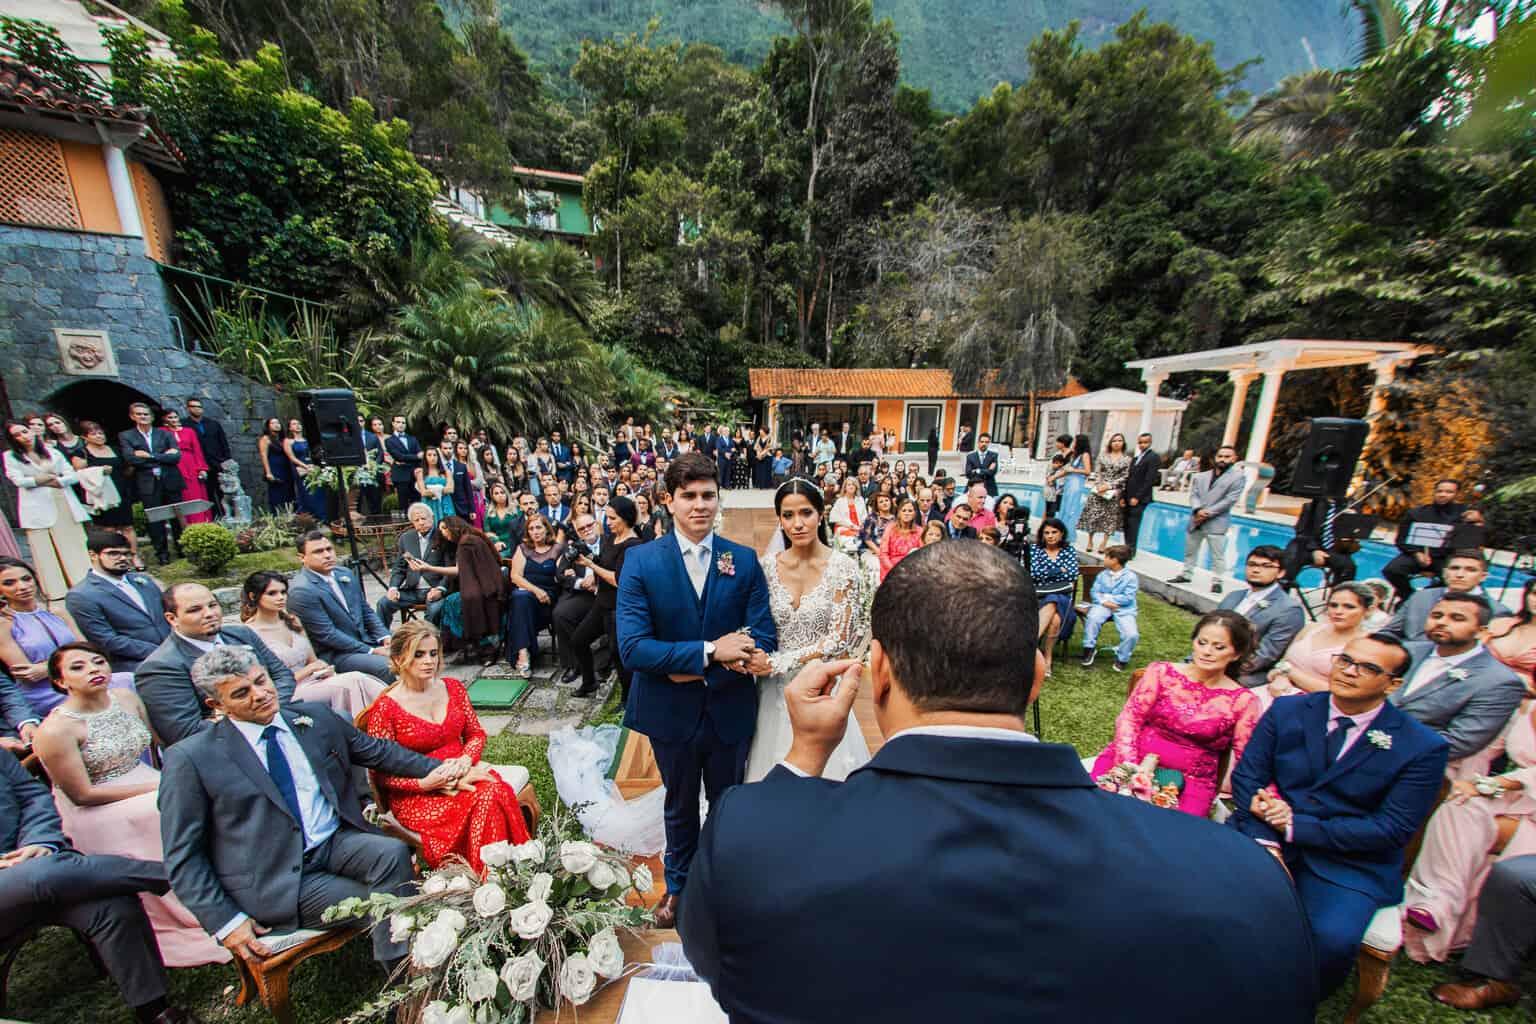 casamento-Beatriz-e-Joao-Fernando-cerimonia-ao-ar-livre-Itaipava-Locanda-Della-Mimosa-Thienny-Tammis162